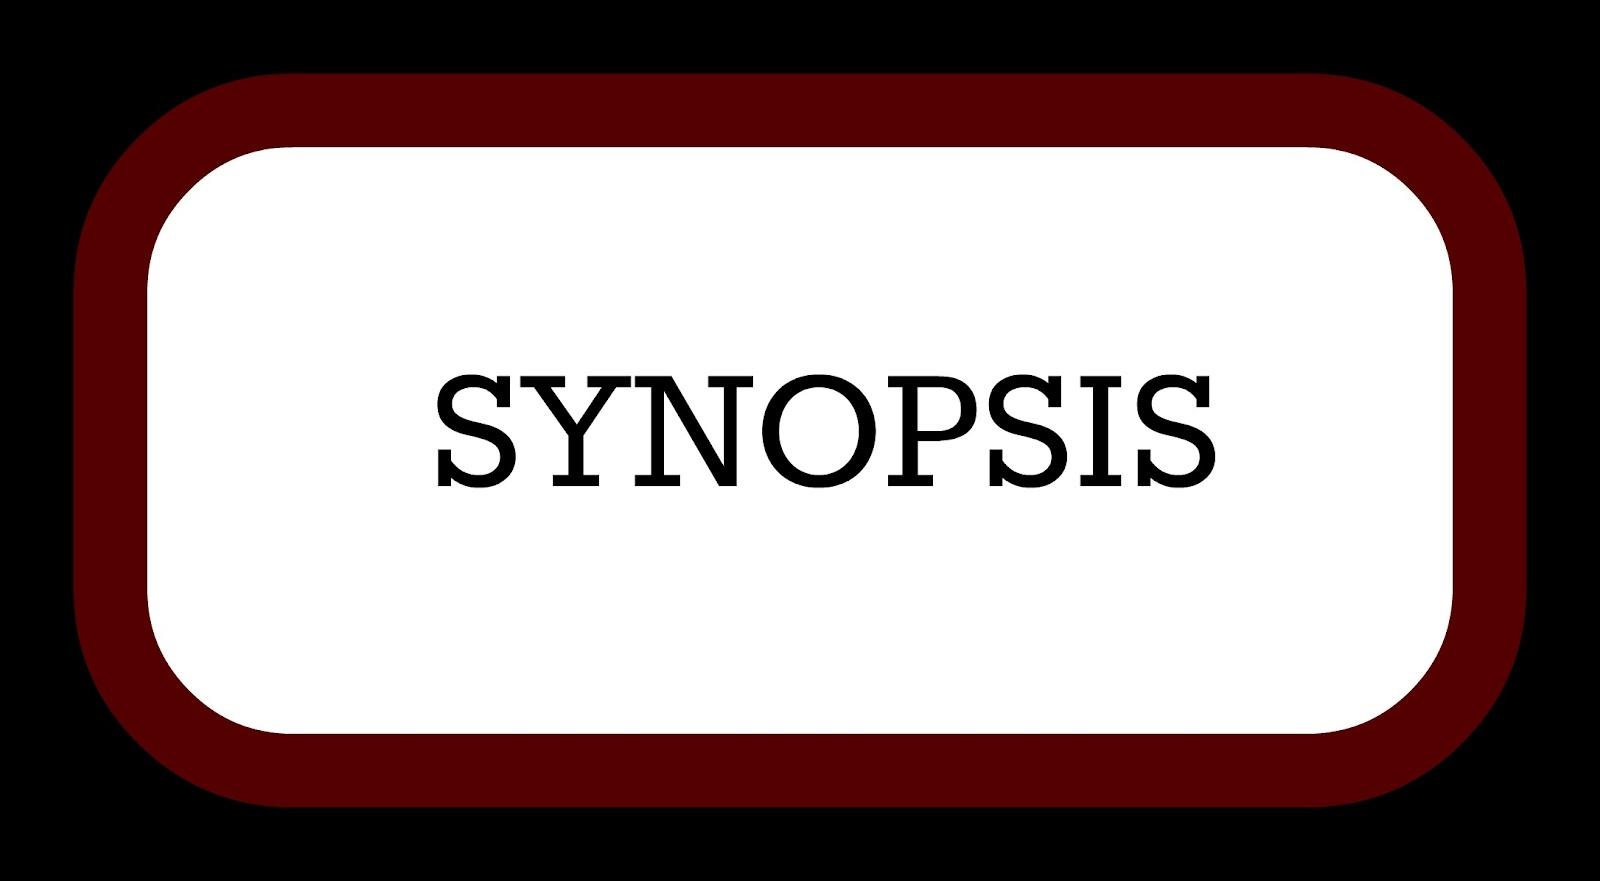 SYNOPSIS3.JPG